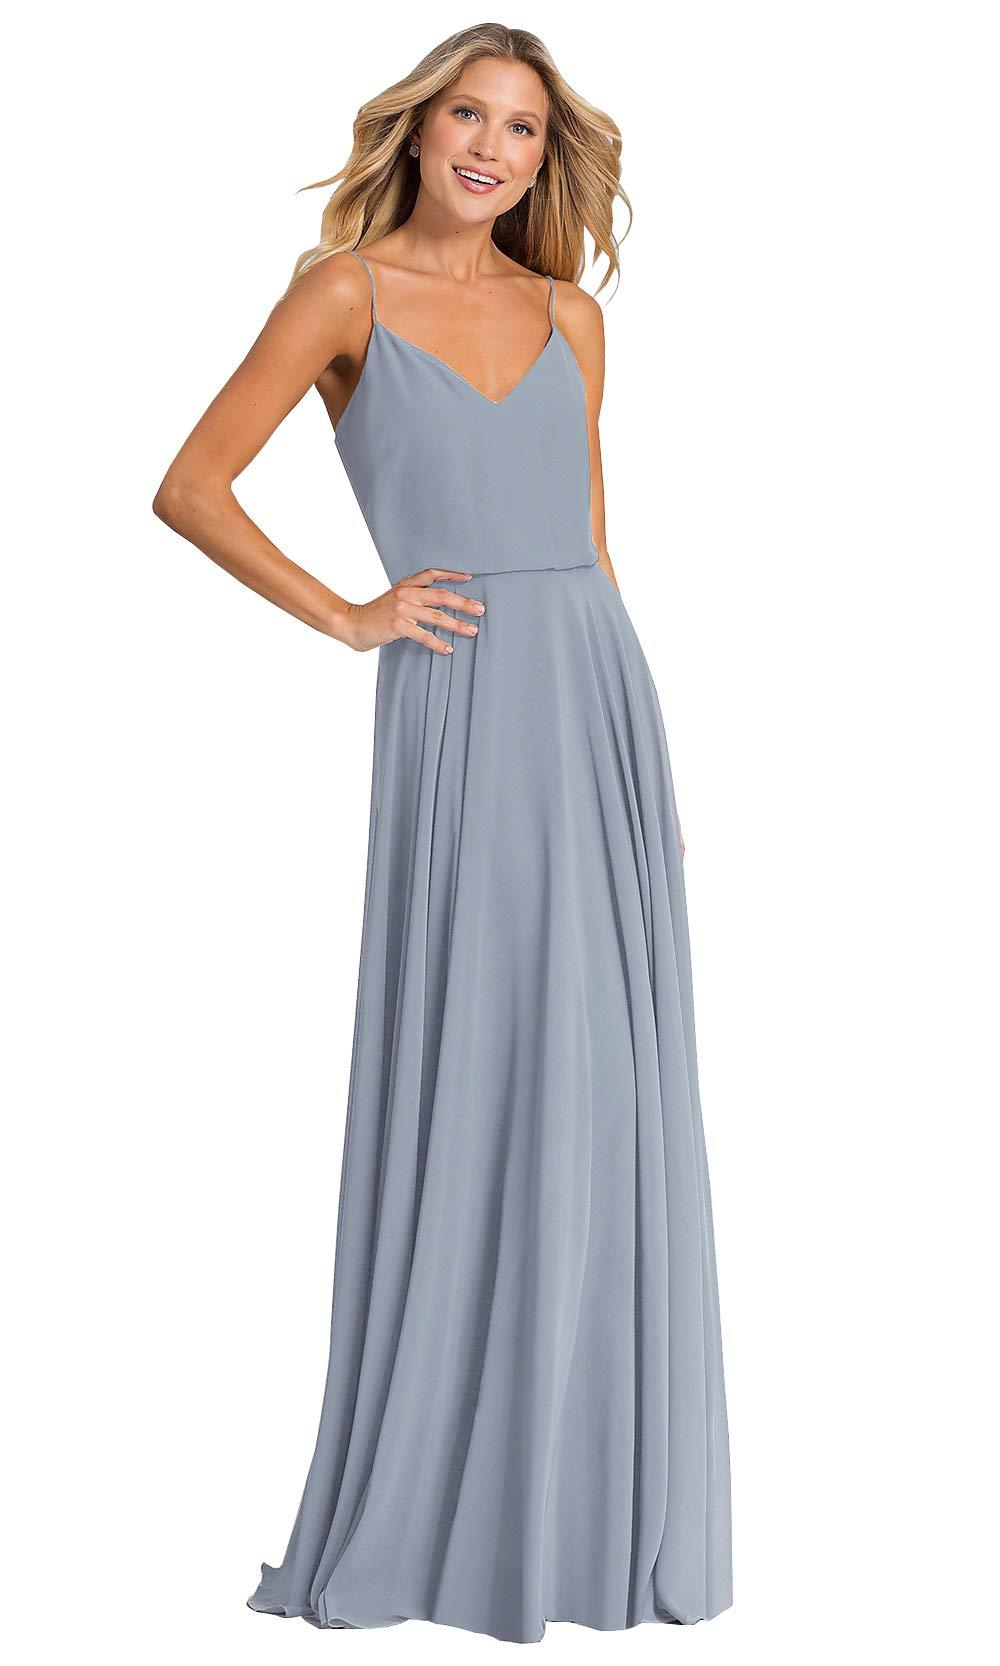 7454c5d9e4 Yilis Women's A-line Long Bridesmaid Dress V-Neck Spaghetti Strap Chiffon  Wedding Party Dress Dusty Blue US4